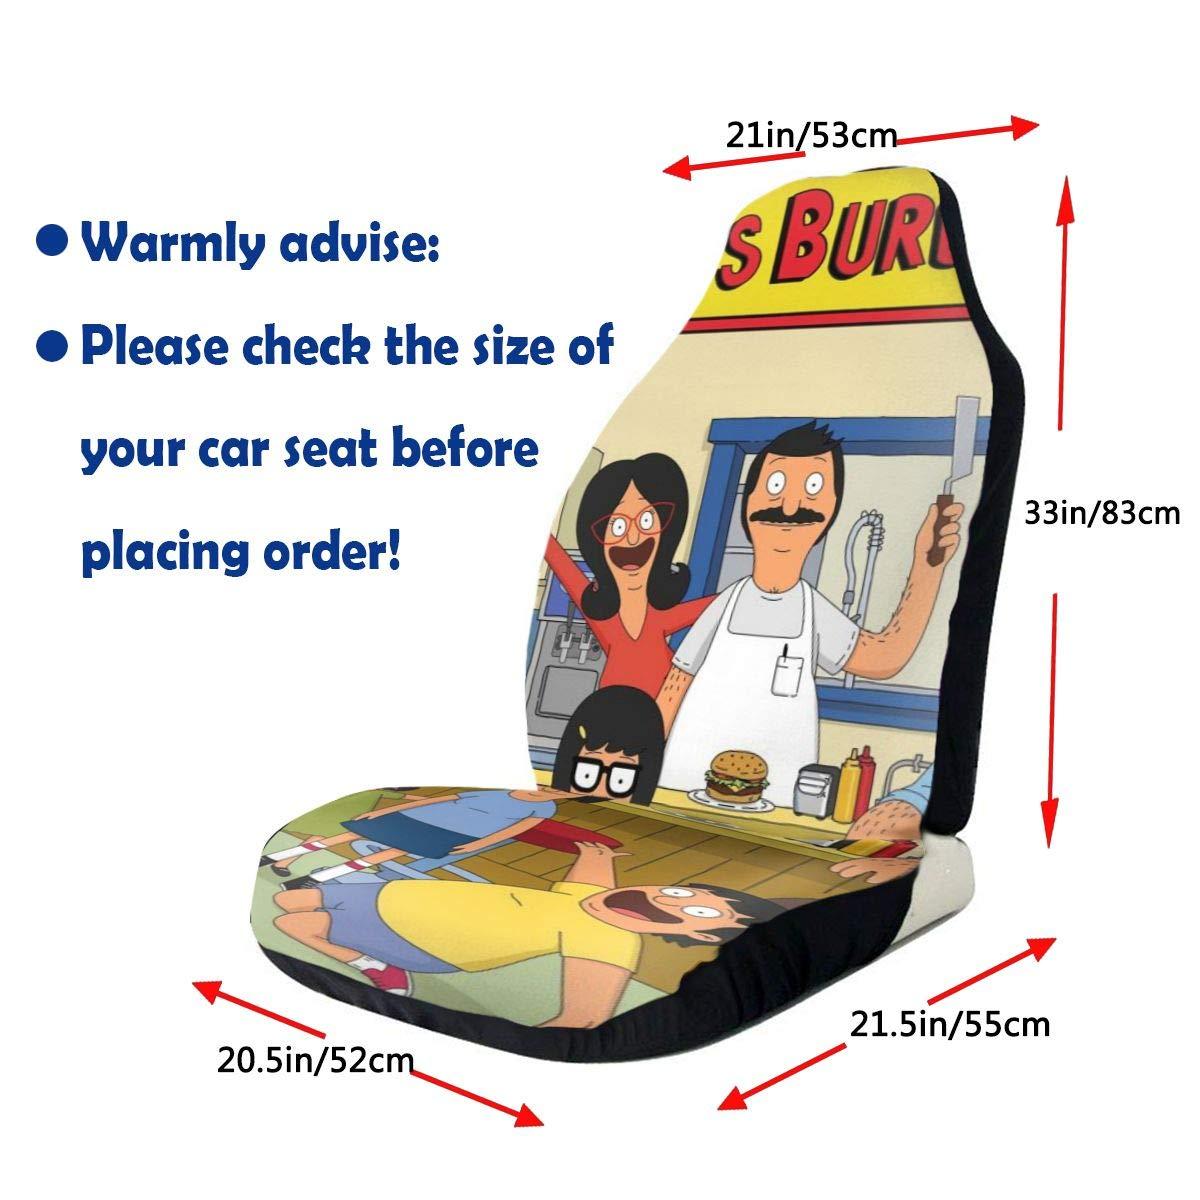 Bobs Burgers Car Seat Covers Nonslip Car Seat Cover Car Seat Protectors Tire Tracks Car Seat Accessories Fit Most Vehicle,Sedan,Truck,Van 1 Pcs